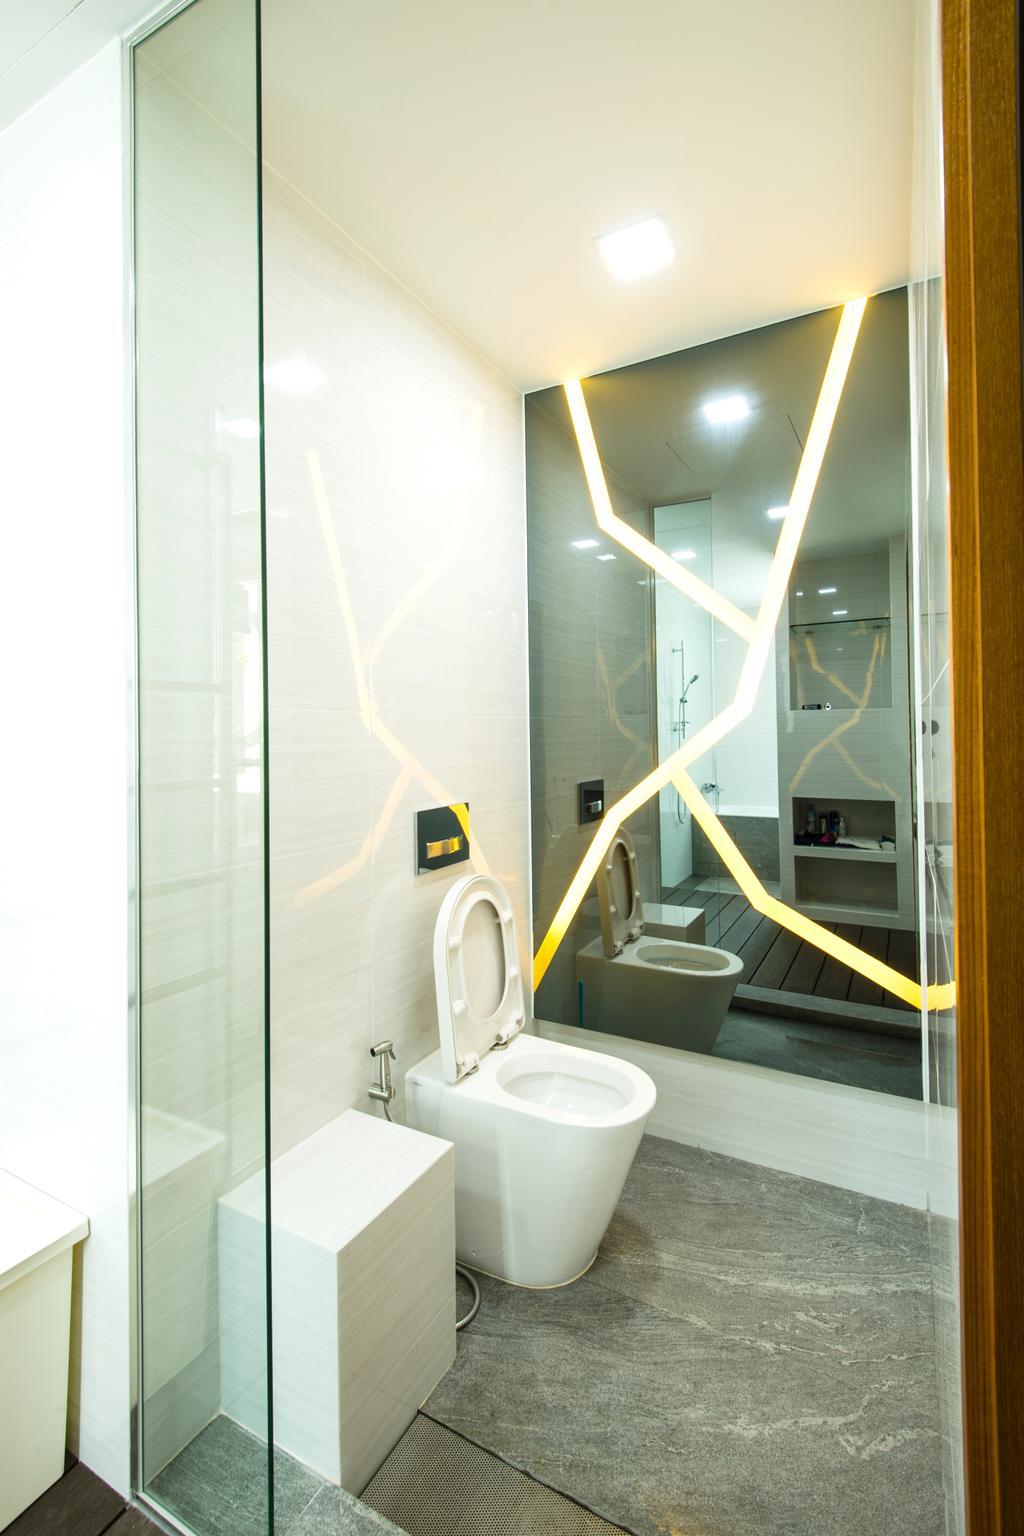 Eclectic, Condo, Bathroom, A Treasure Trove, Interior Designer, Hue Concept Interior Design, Wall Mirror, Tiles, Water Closet, White Tiles, Toilet Bowl, Toilet, Indoors, Interior Design, Room